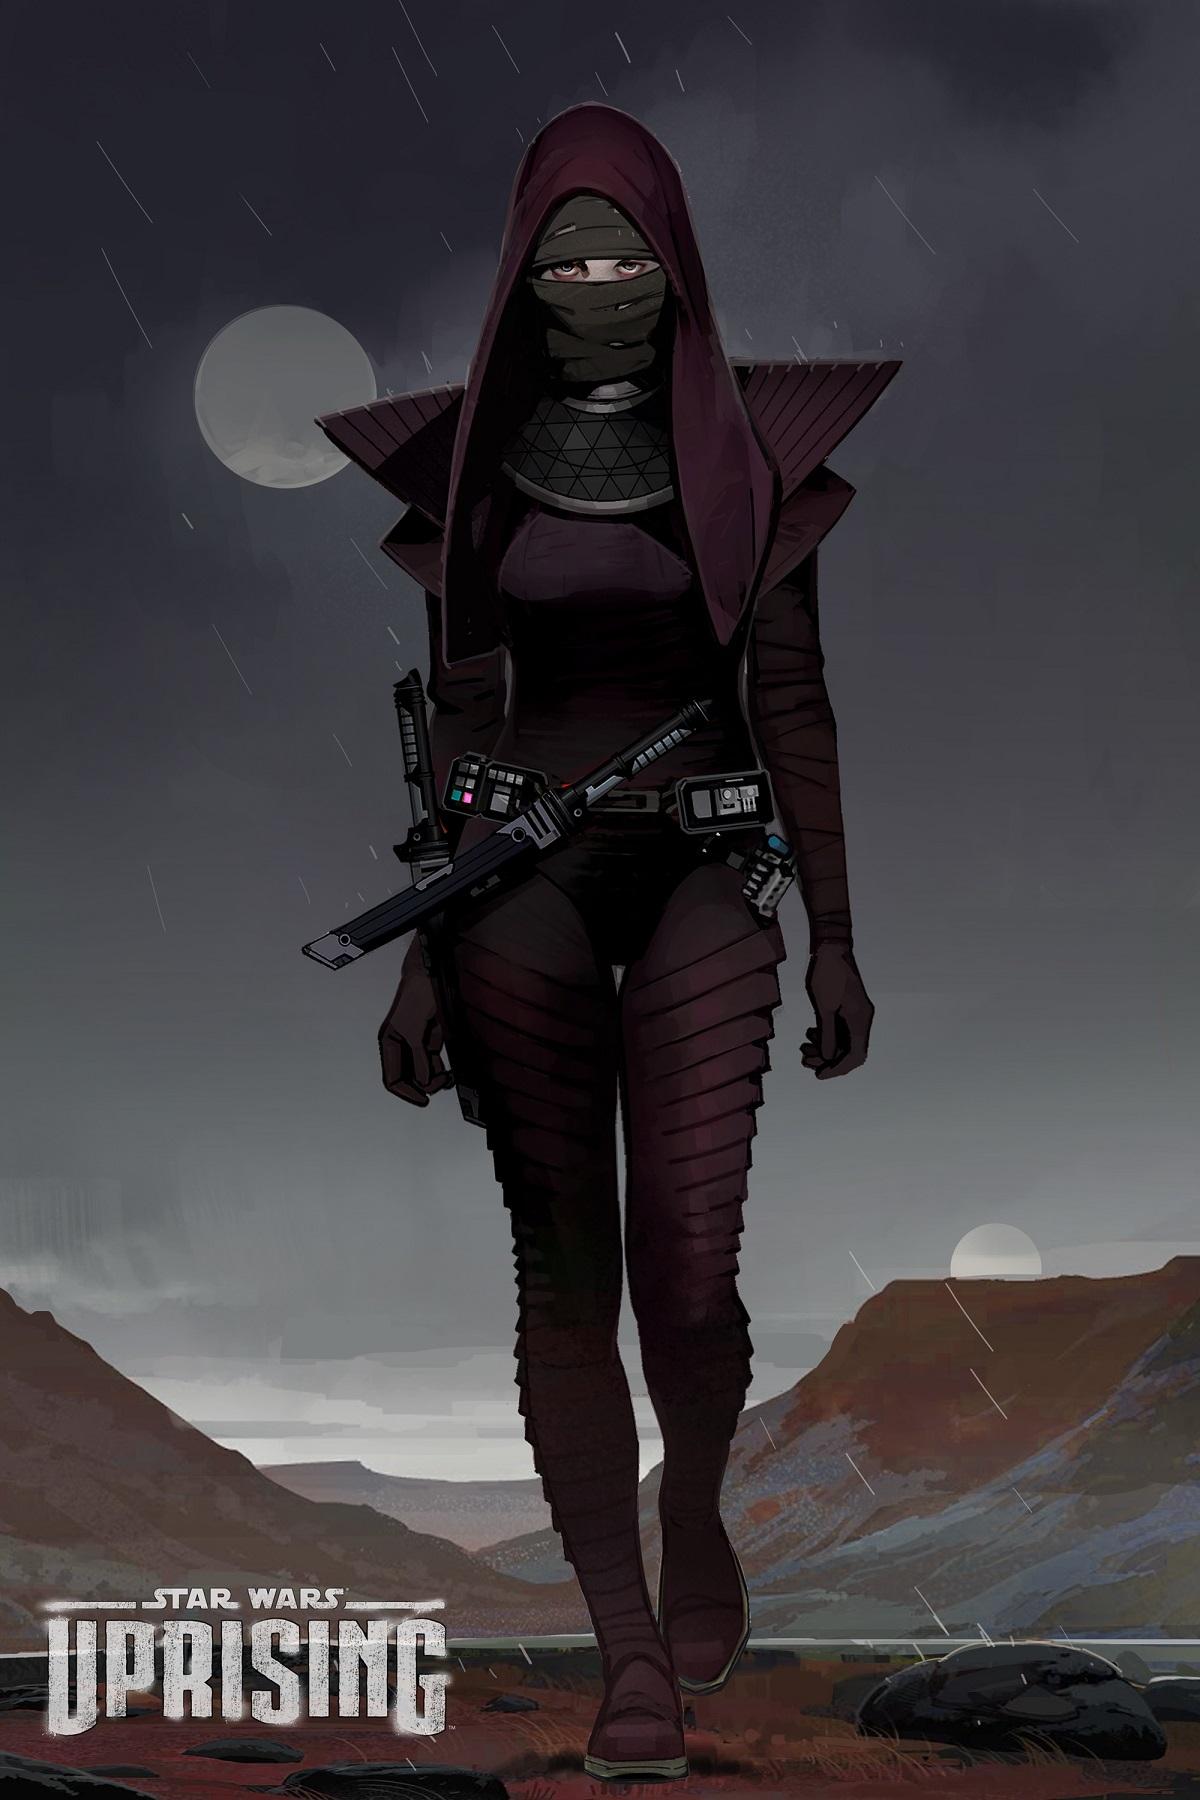 StarWars-Uprising Multi Visuel 005